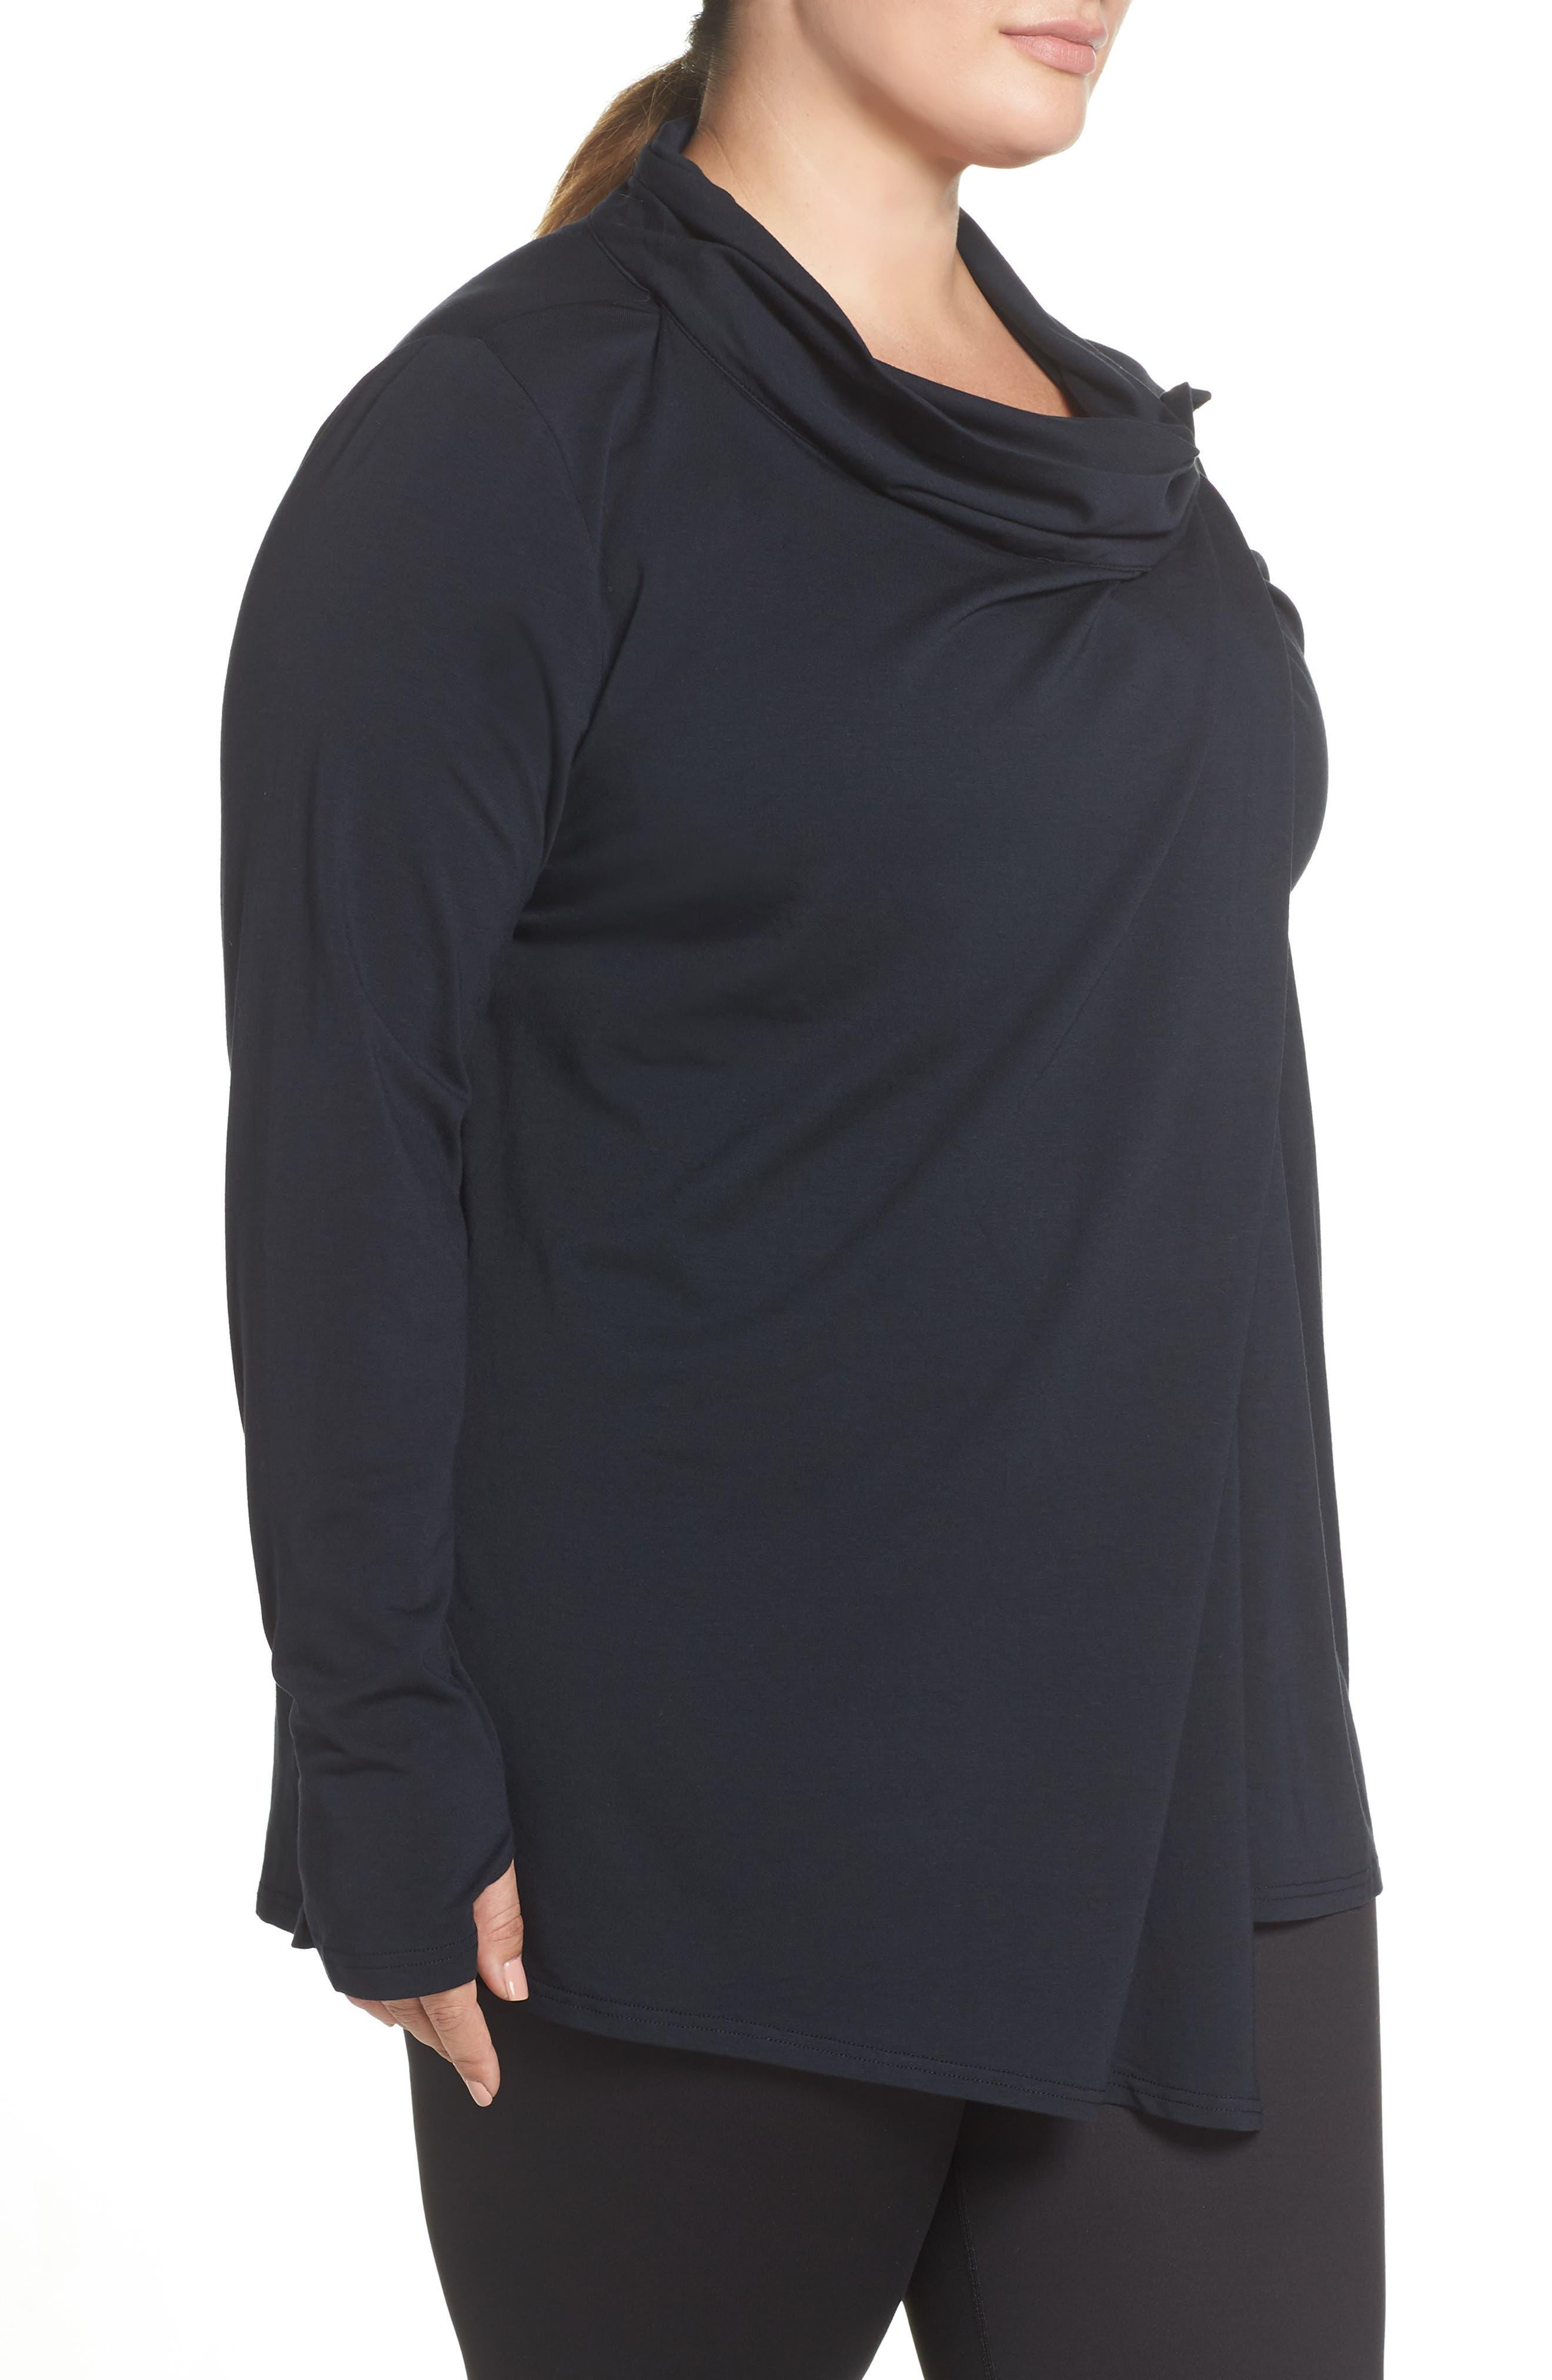 SHAPE ACTIVEWEAR,                             Odyssey Wrap Jacket,                             Alternate thumbnail 3, color,                             CAVIAR BLACK